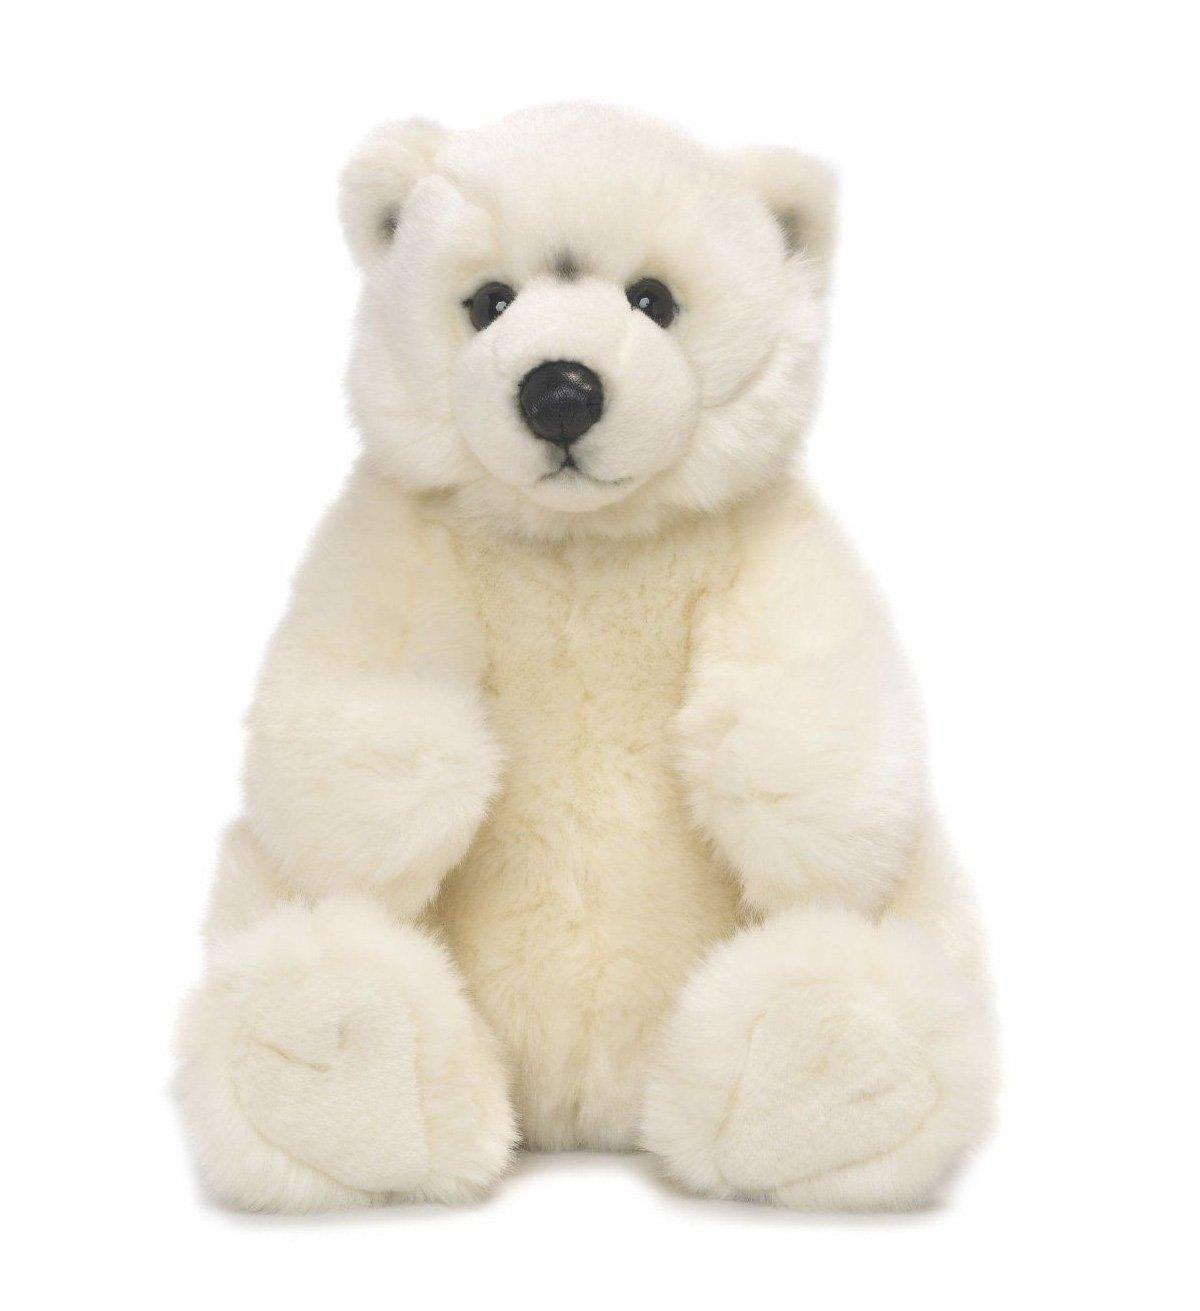 WWF - Polar bear sitting - 22 cm (v15187004)